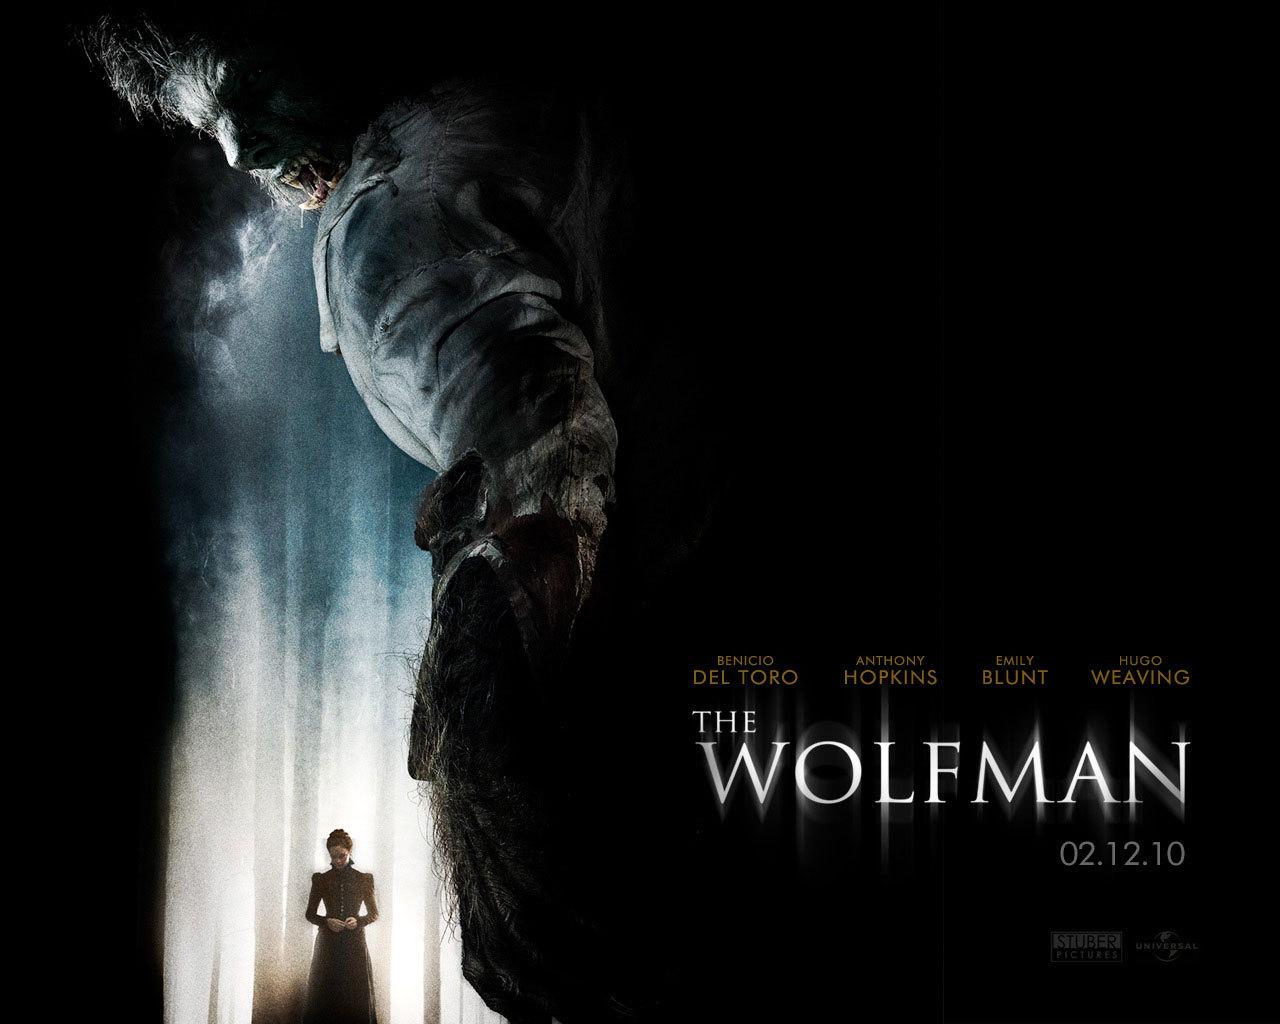 the wolfman 2010 upcoming movies wallpaper 9873376